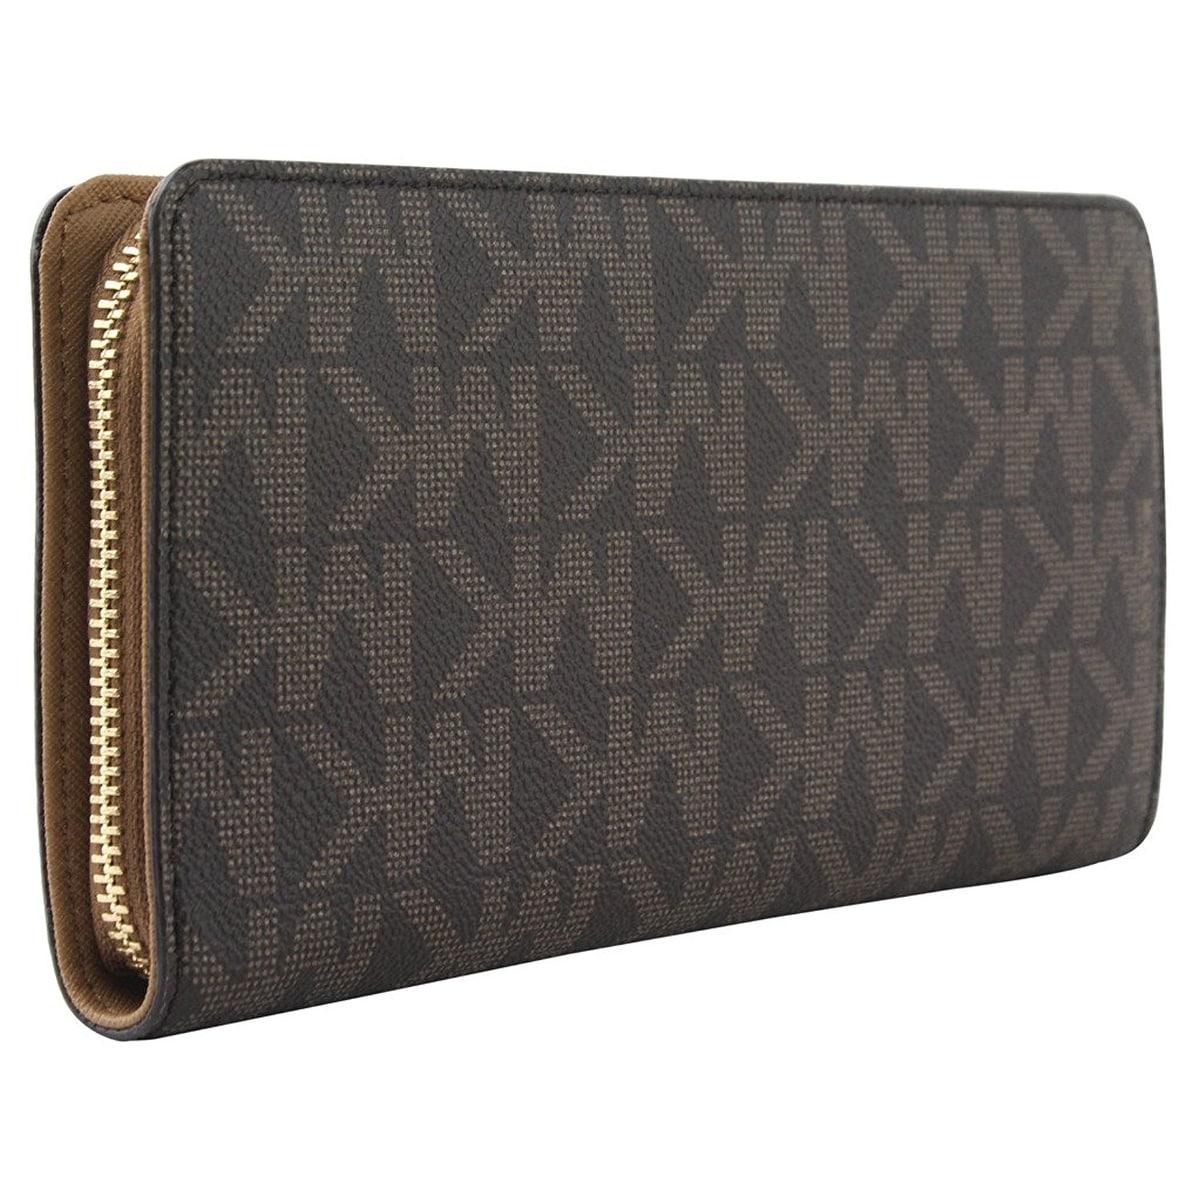 3c7647dab29dc3 Shop Michael Kors Hamilton Traveler Large Zip Around Wallet - Free Shipping  Today - Overstock - 18742264